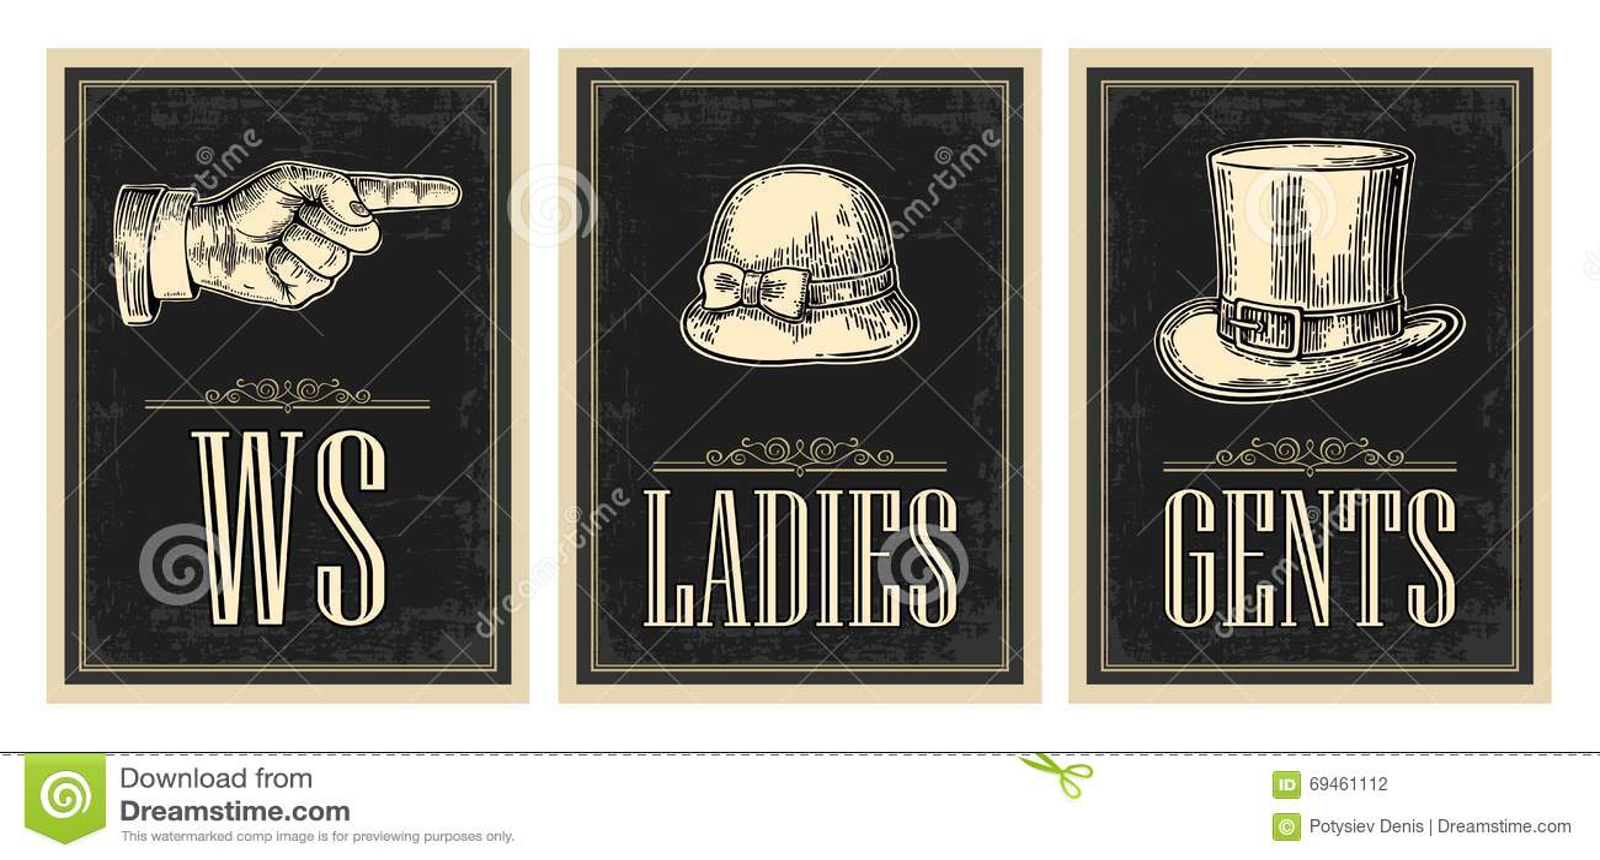 toilet retro vintage grunge poster ladies cents pointing finger stock vector image 69461112. Black Bedroom Furniture Sets. Home Design Ideas